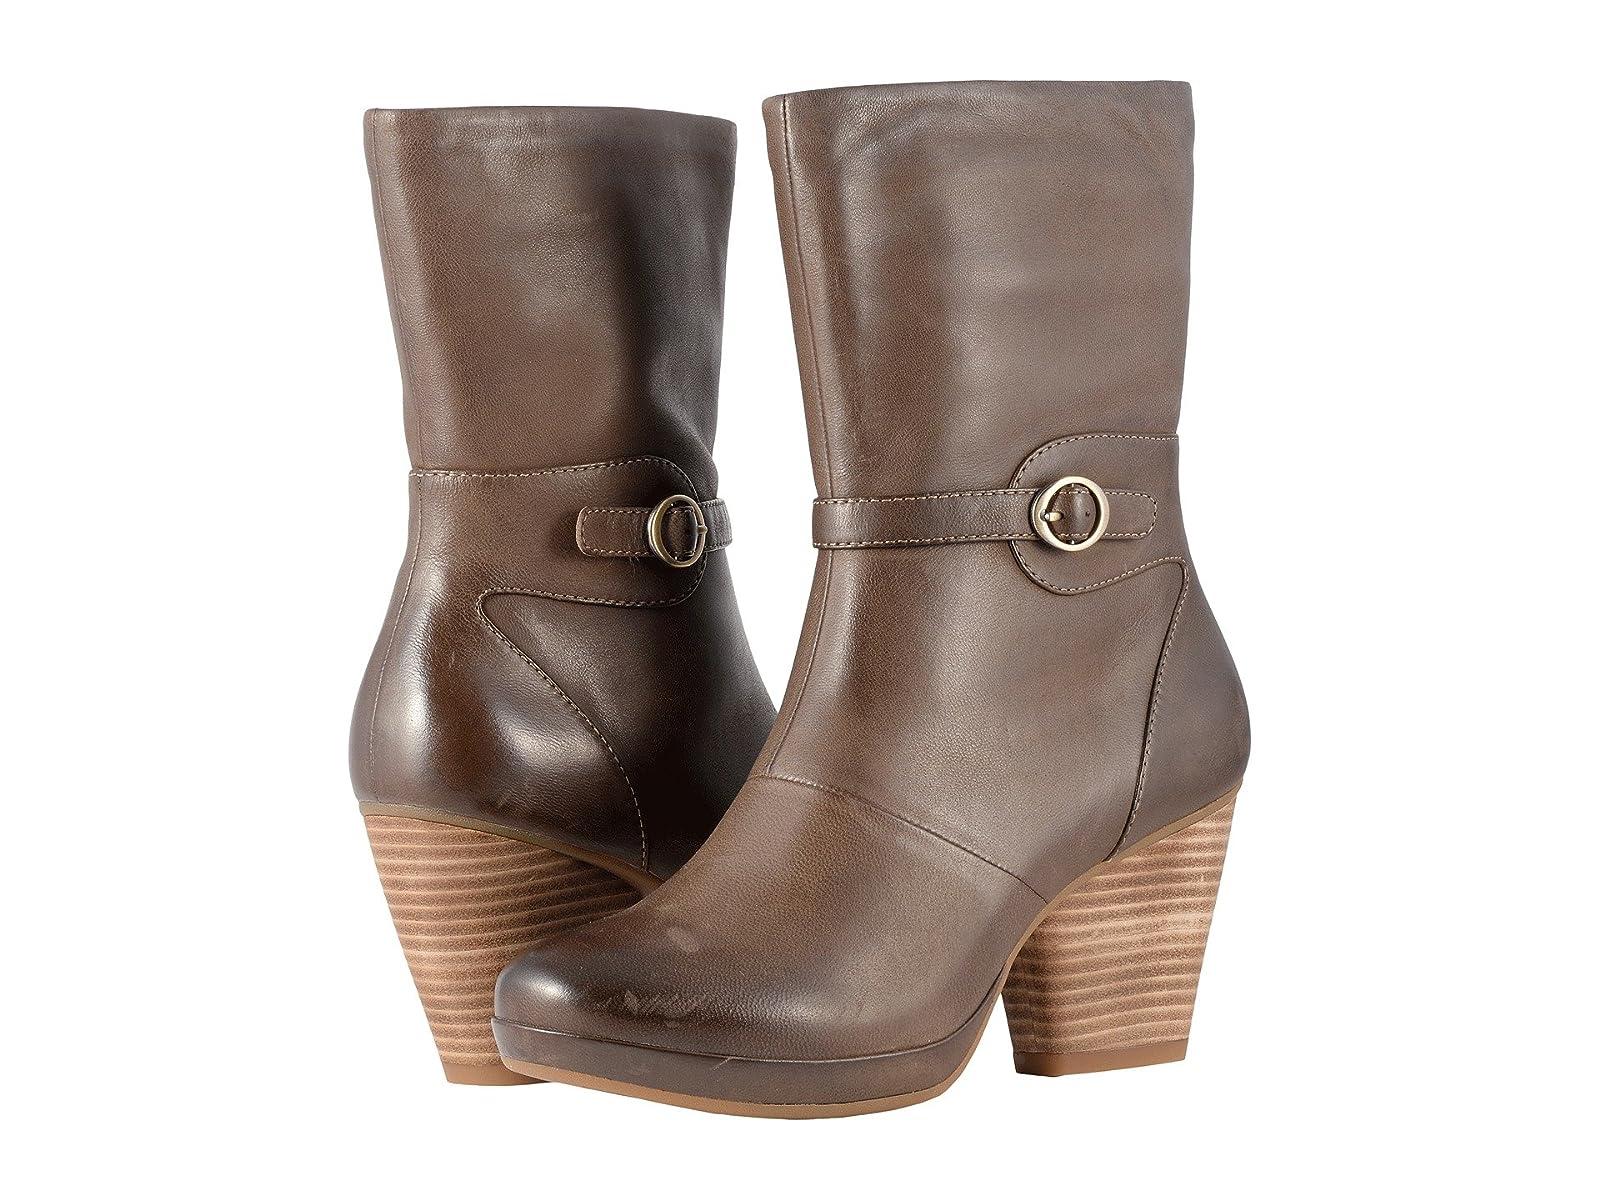 Dansko MariettaCheap and distinctive eye-catching shoes